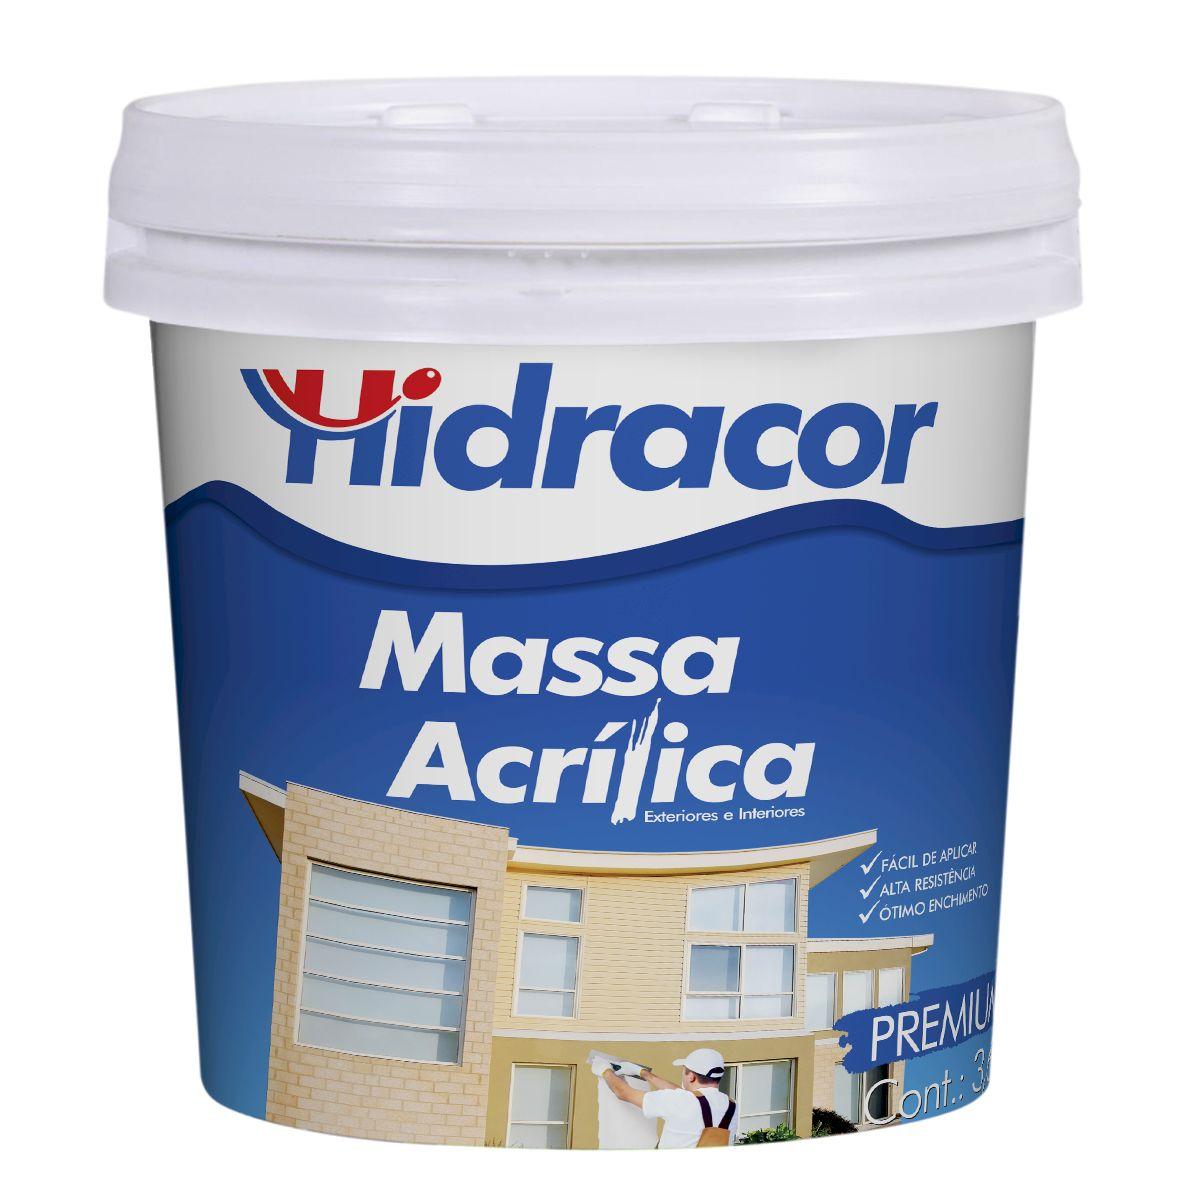 Massa Acrílica 3,6 Litros/5,5kg Hidracor